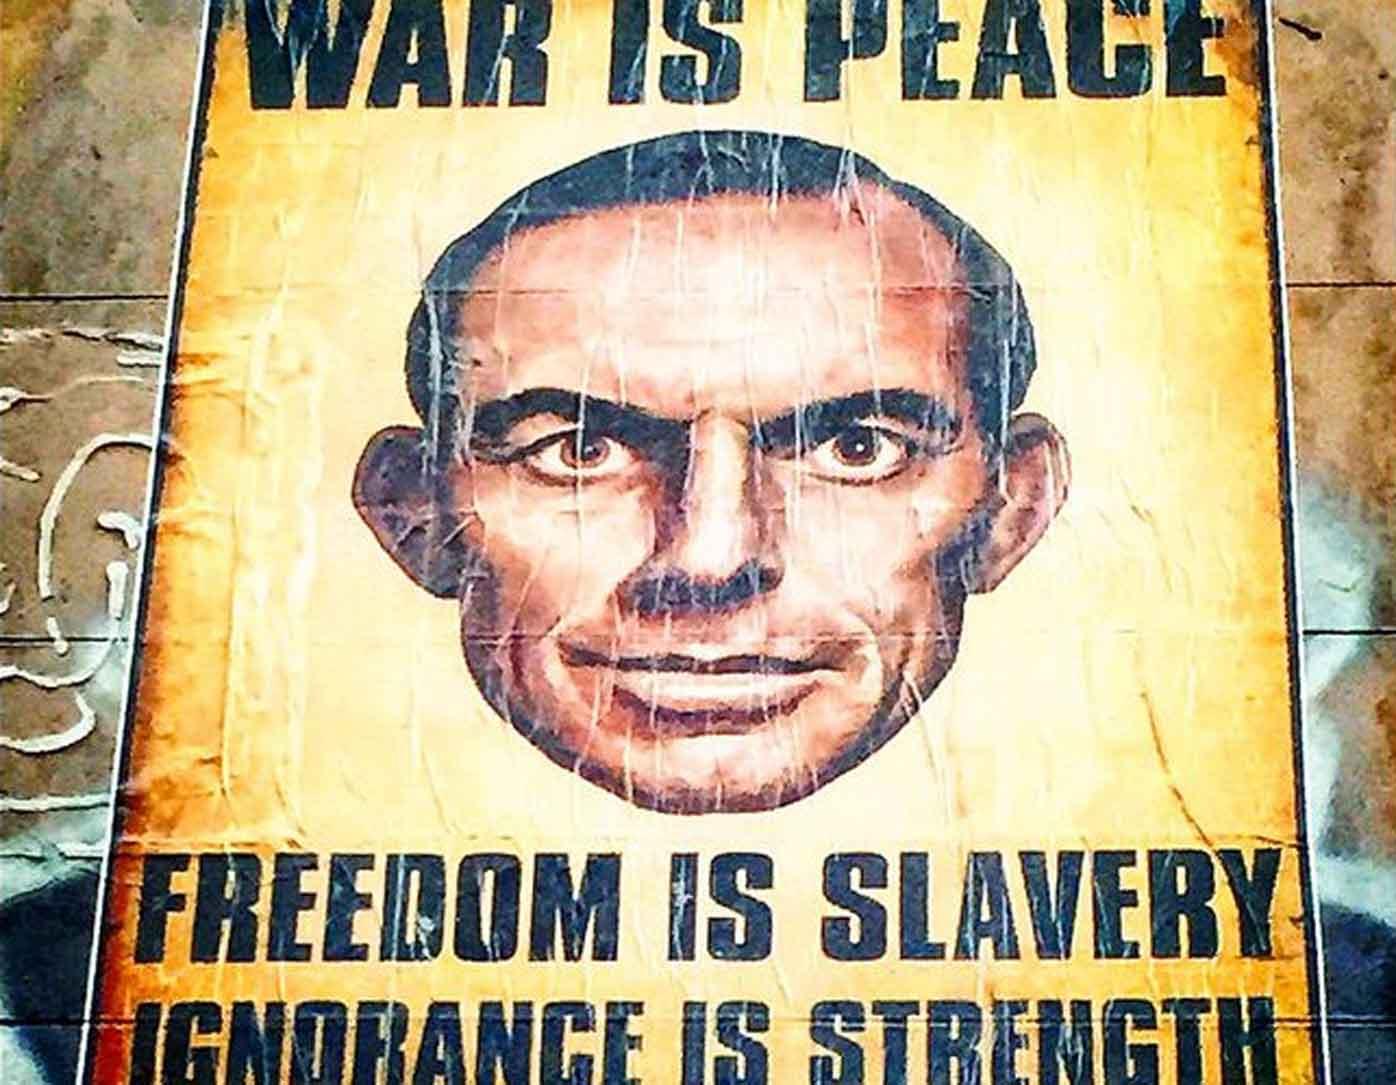 The Tony Abbott 1984 poster.